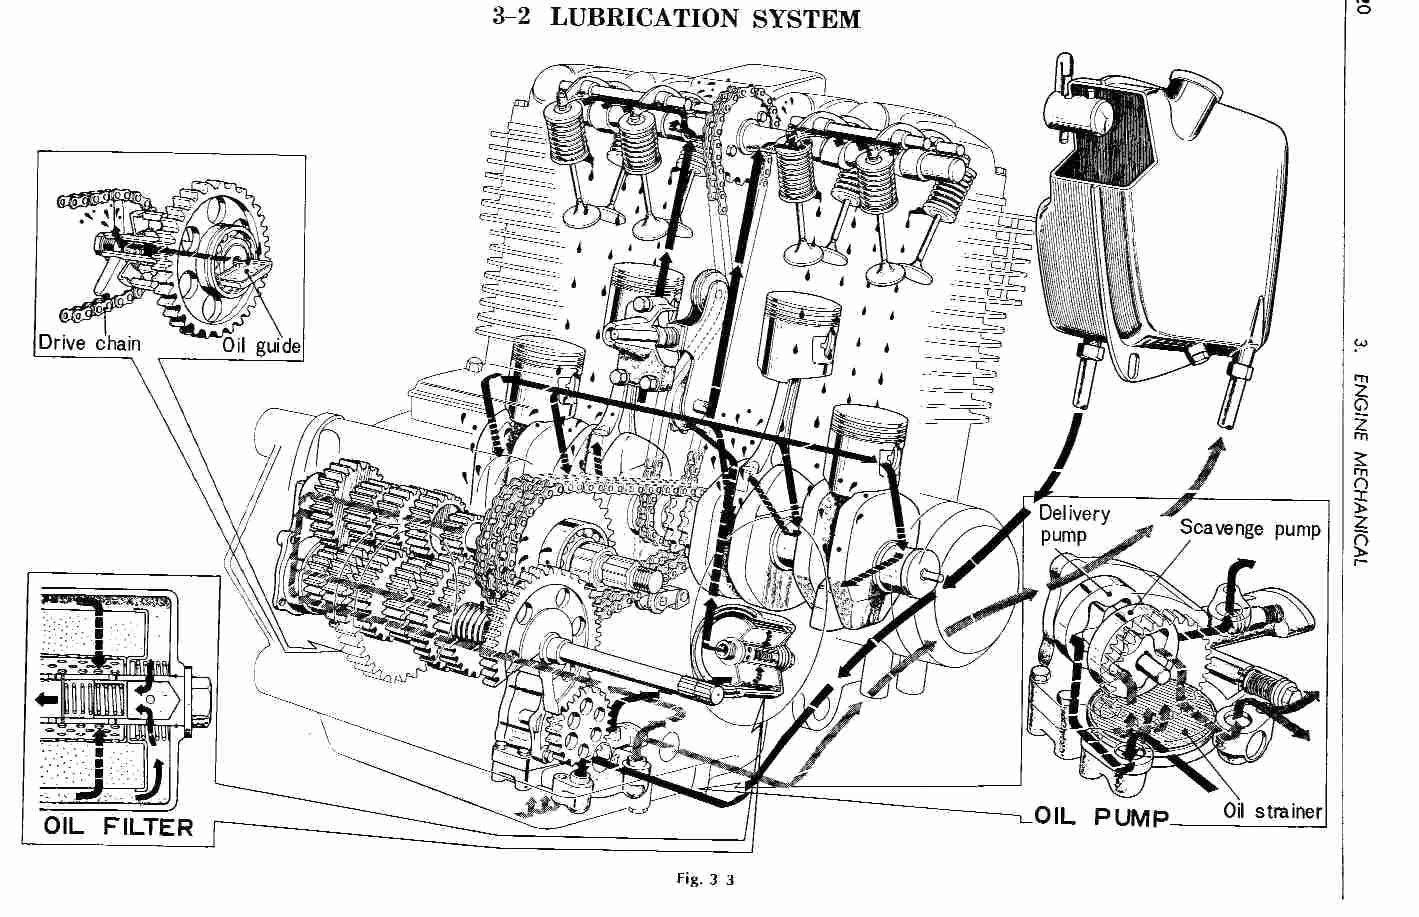 Cb 750 wiring diagram awesome wiring diagram image